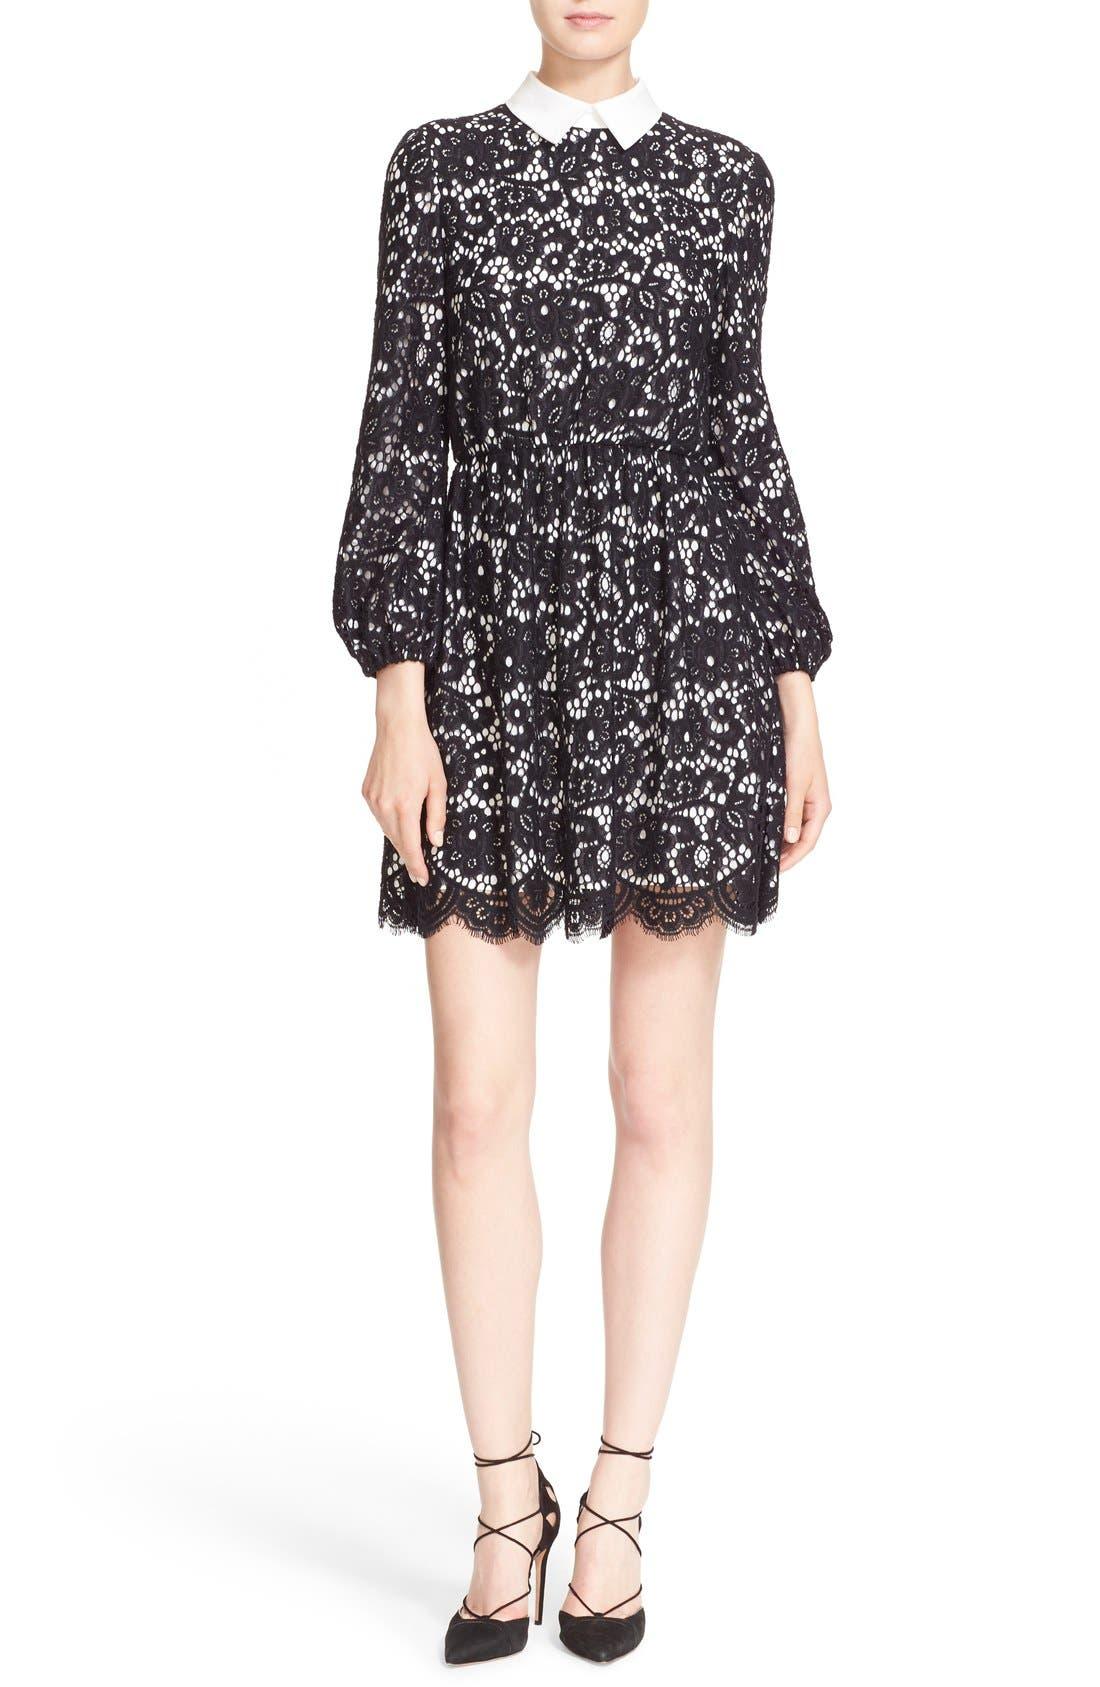 Alternate Image 1 Selected - Alice + Olivia 'Terisa' Collared Blouson Sleeve Lace Dress